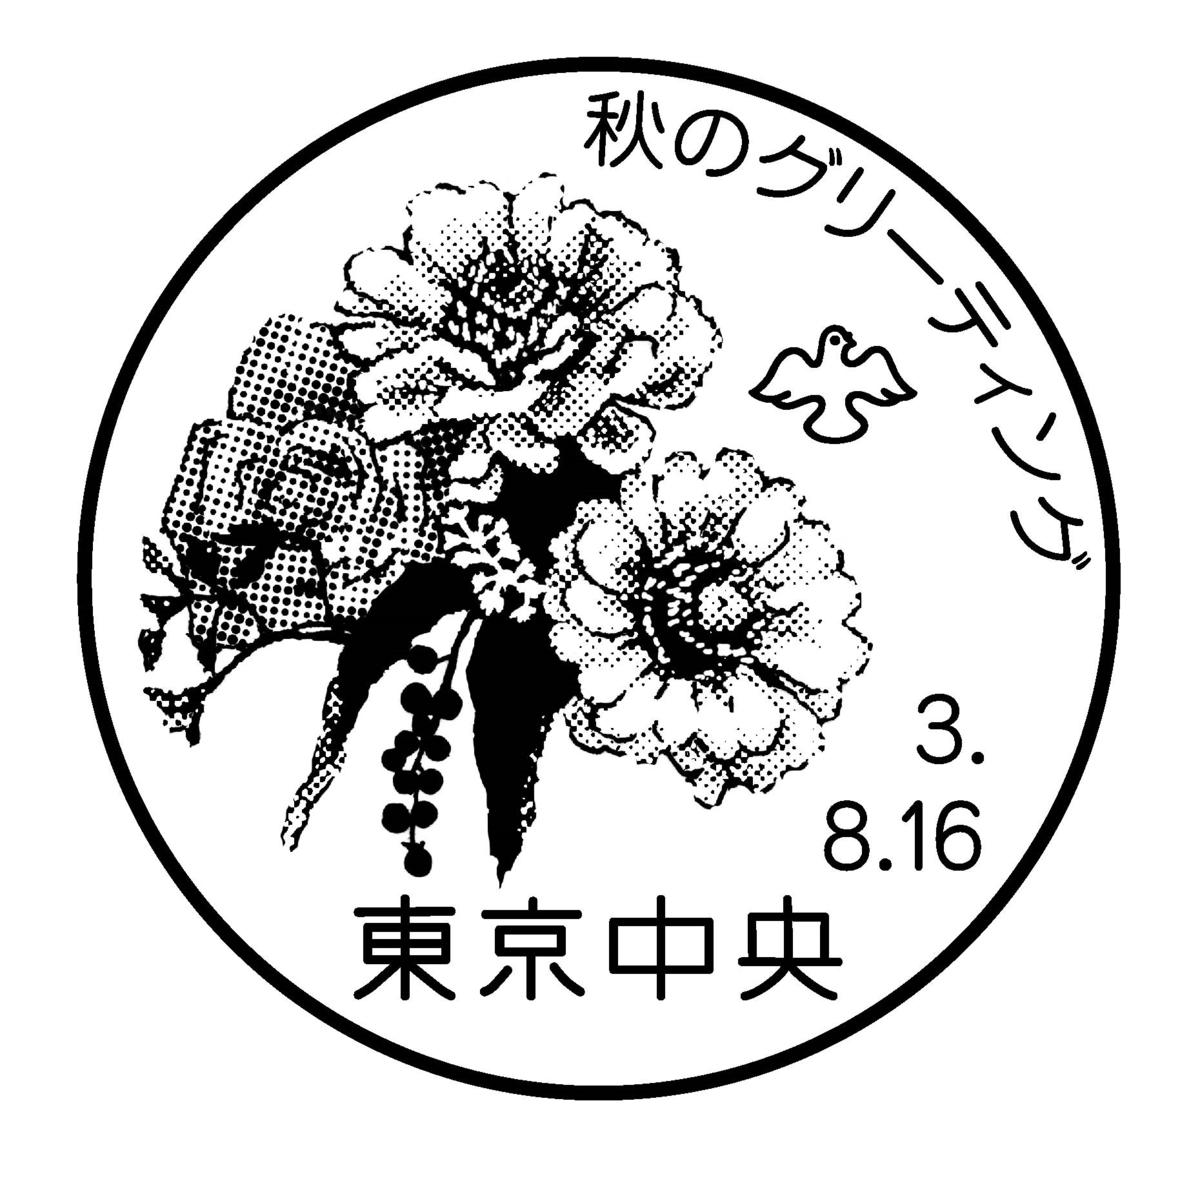 f:id:manok-rosen:20210727014003p:plain